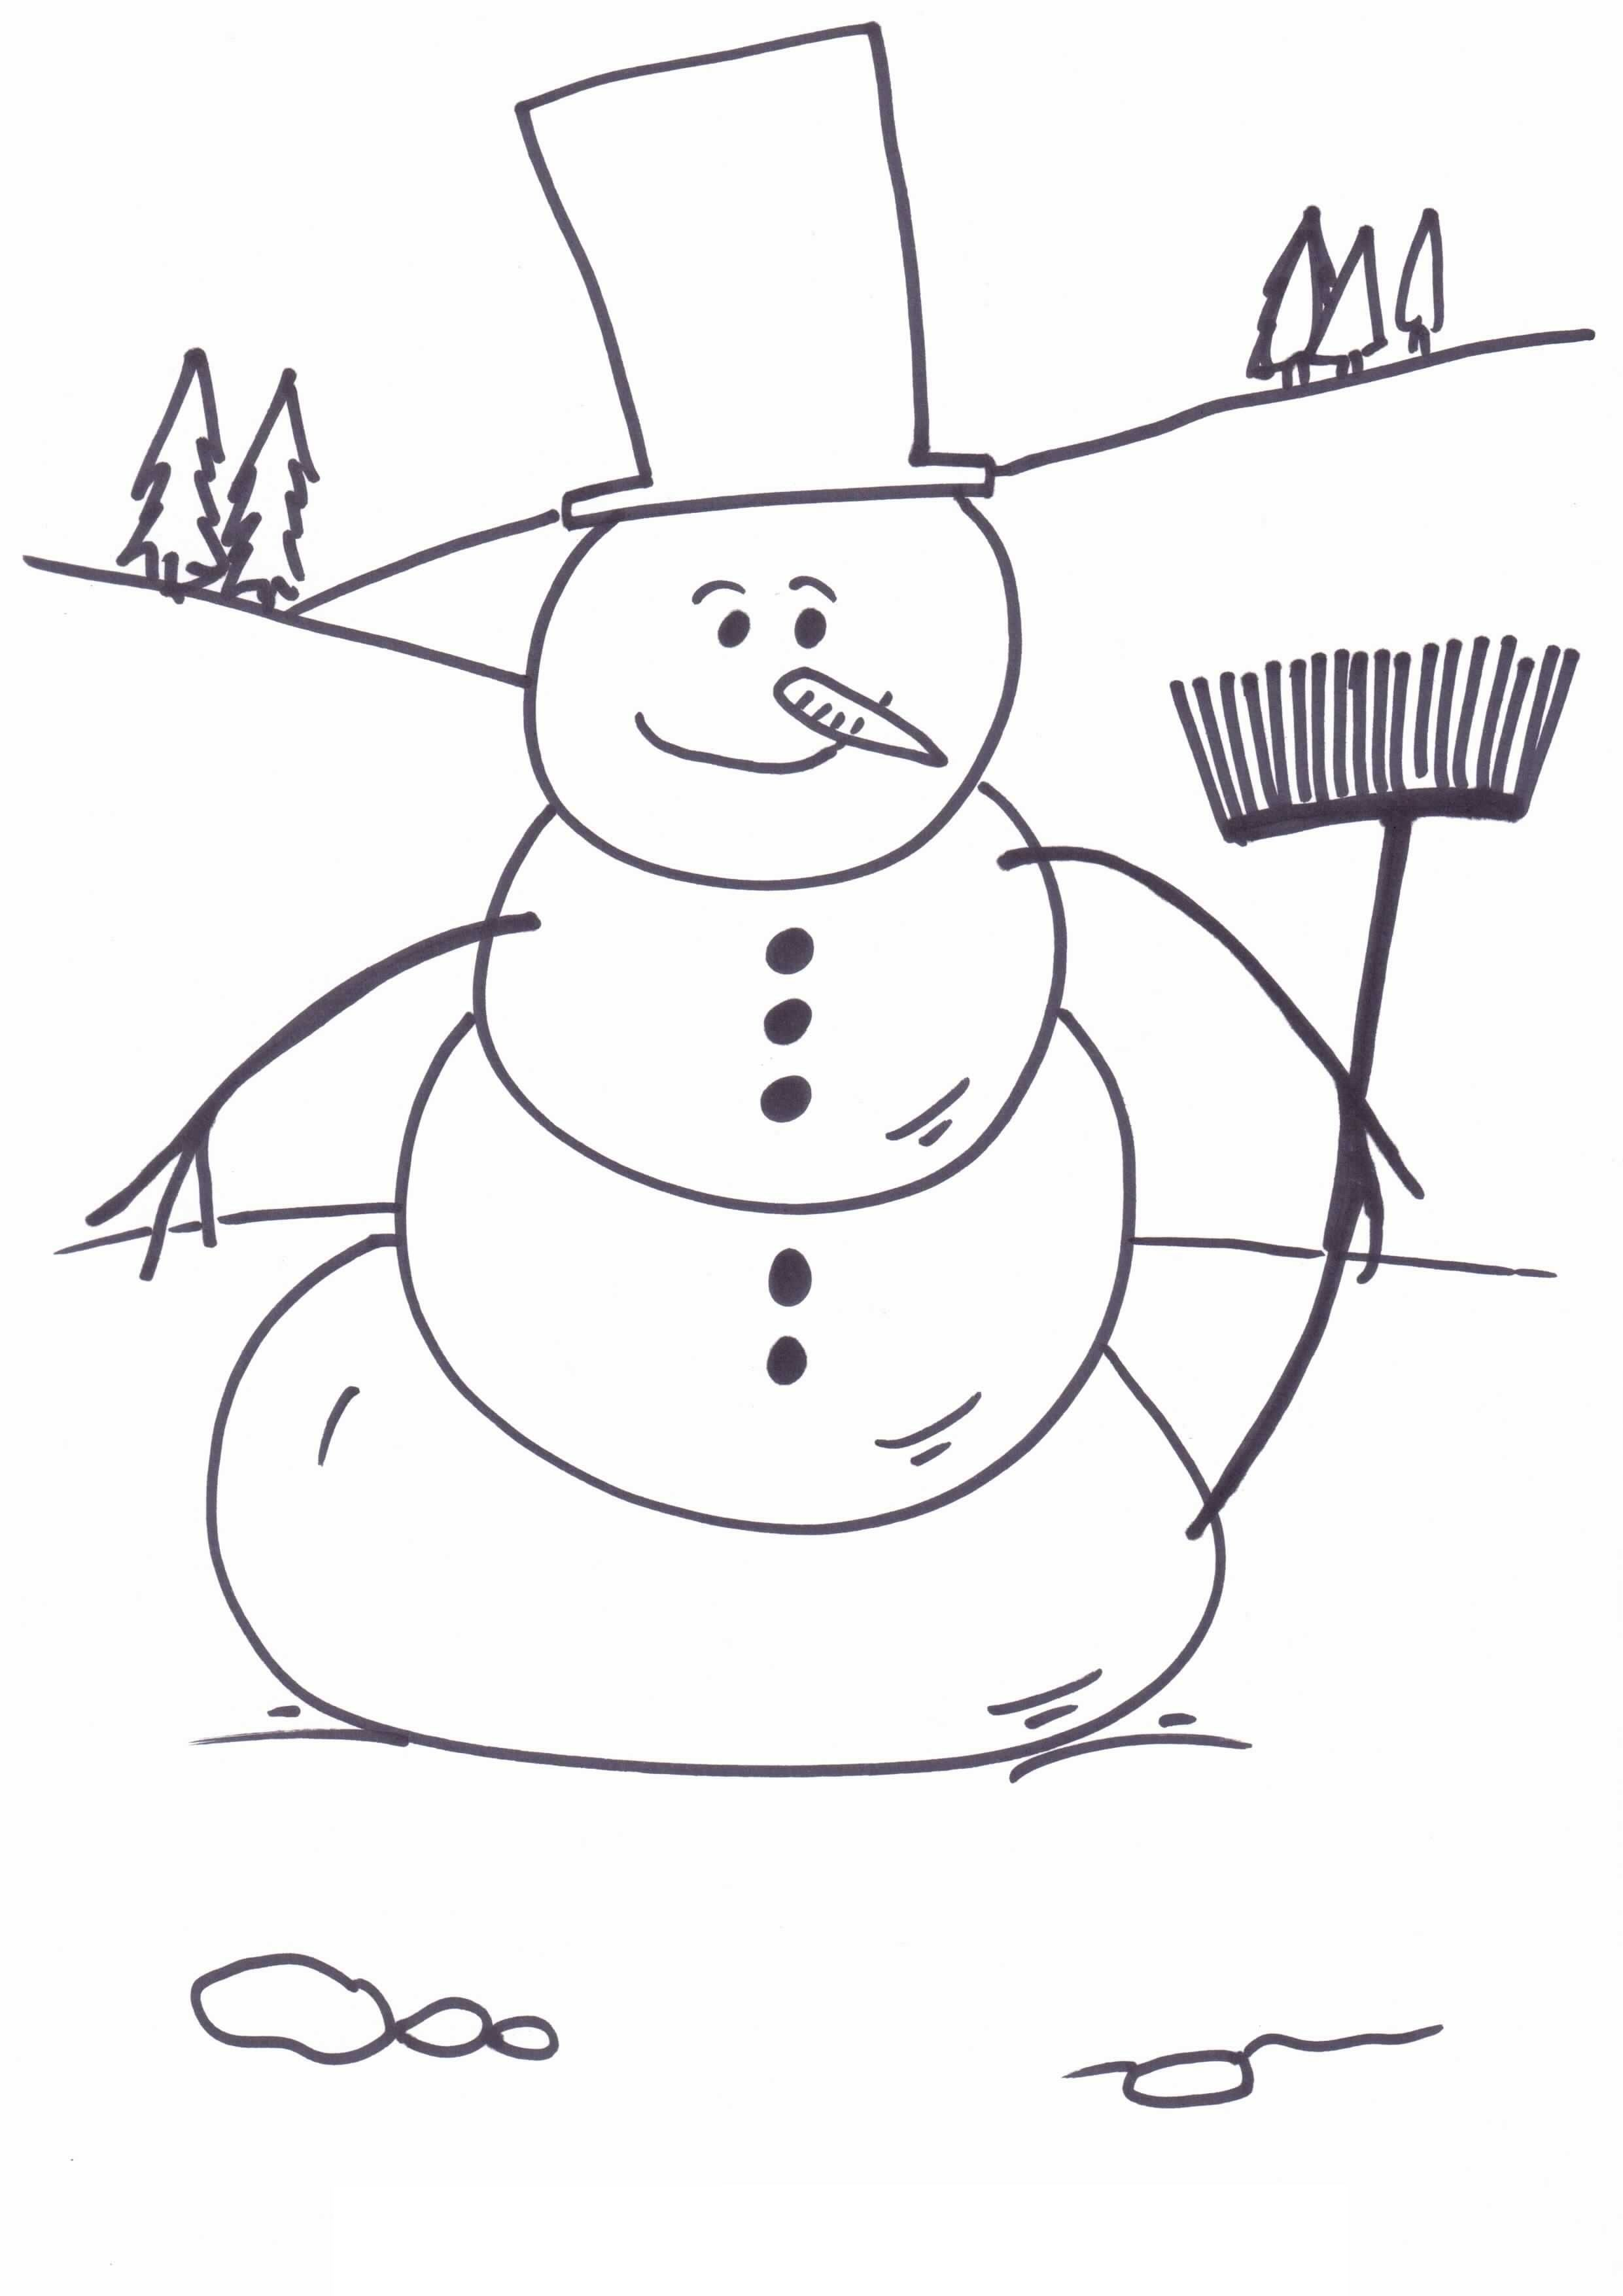 Christmas Coloring Pages Snowman | Guiding Little Minds | Pinterest